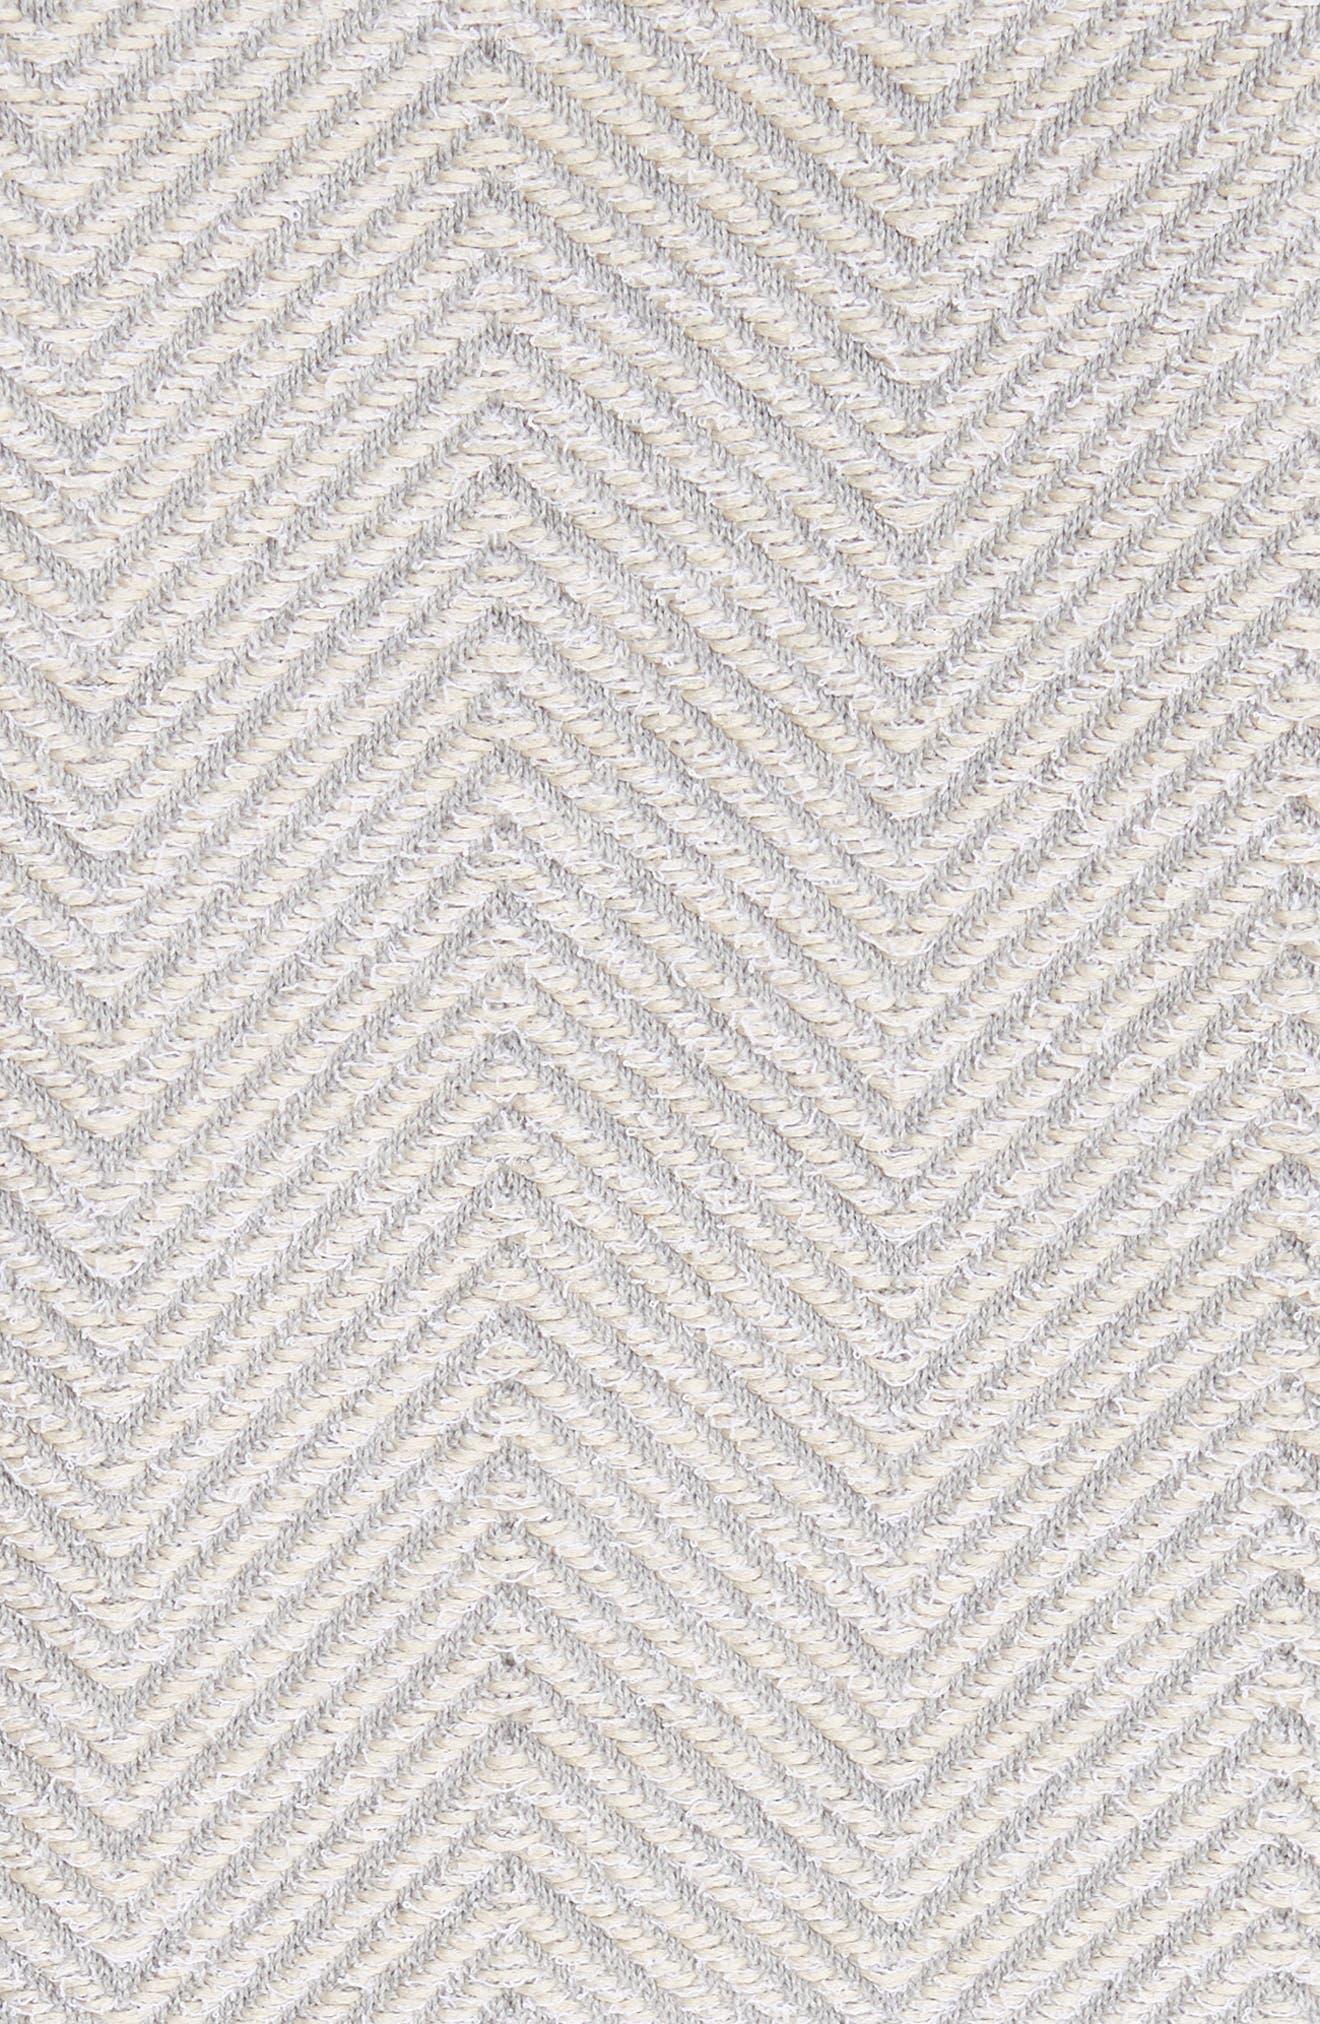 Fringe Trim Chevron Jacket,                             Alternate thumbnail 7, color,                             Grey Beige